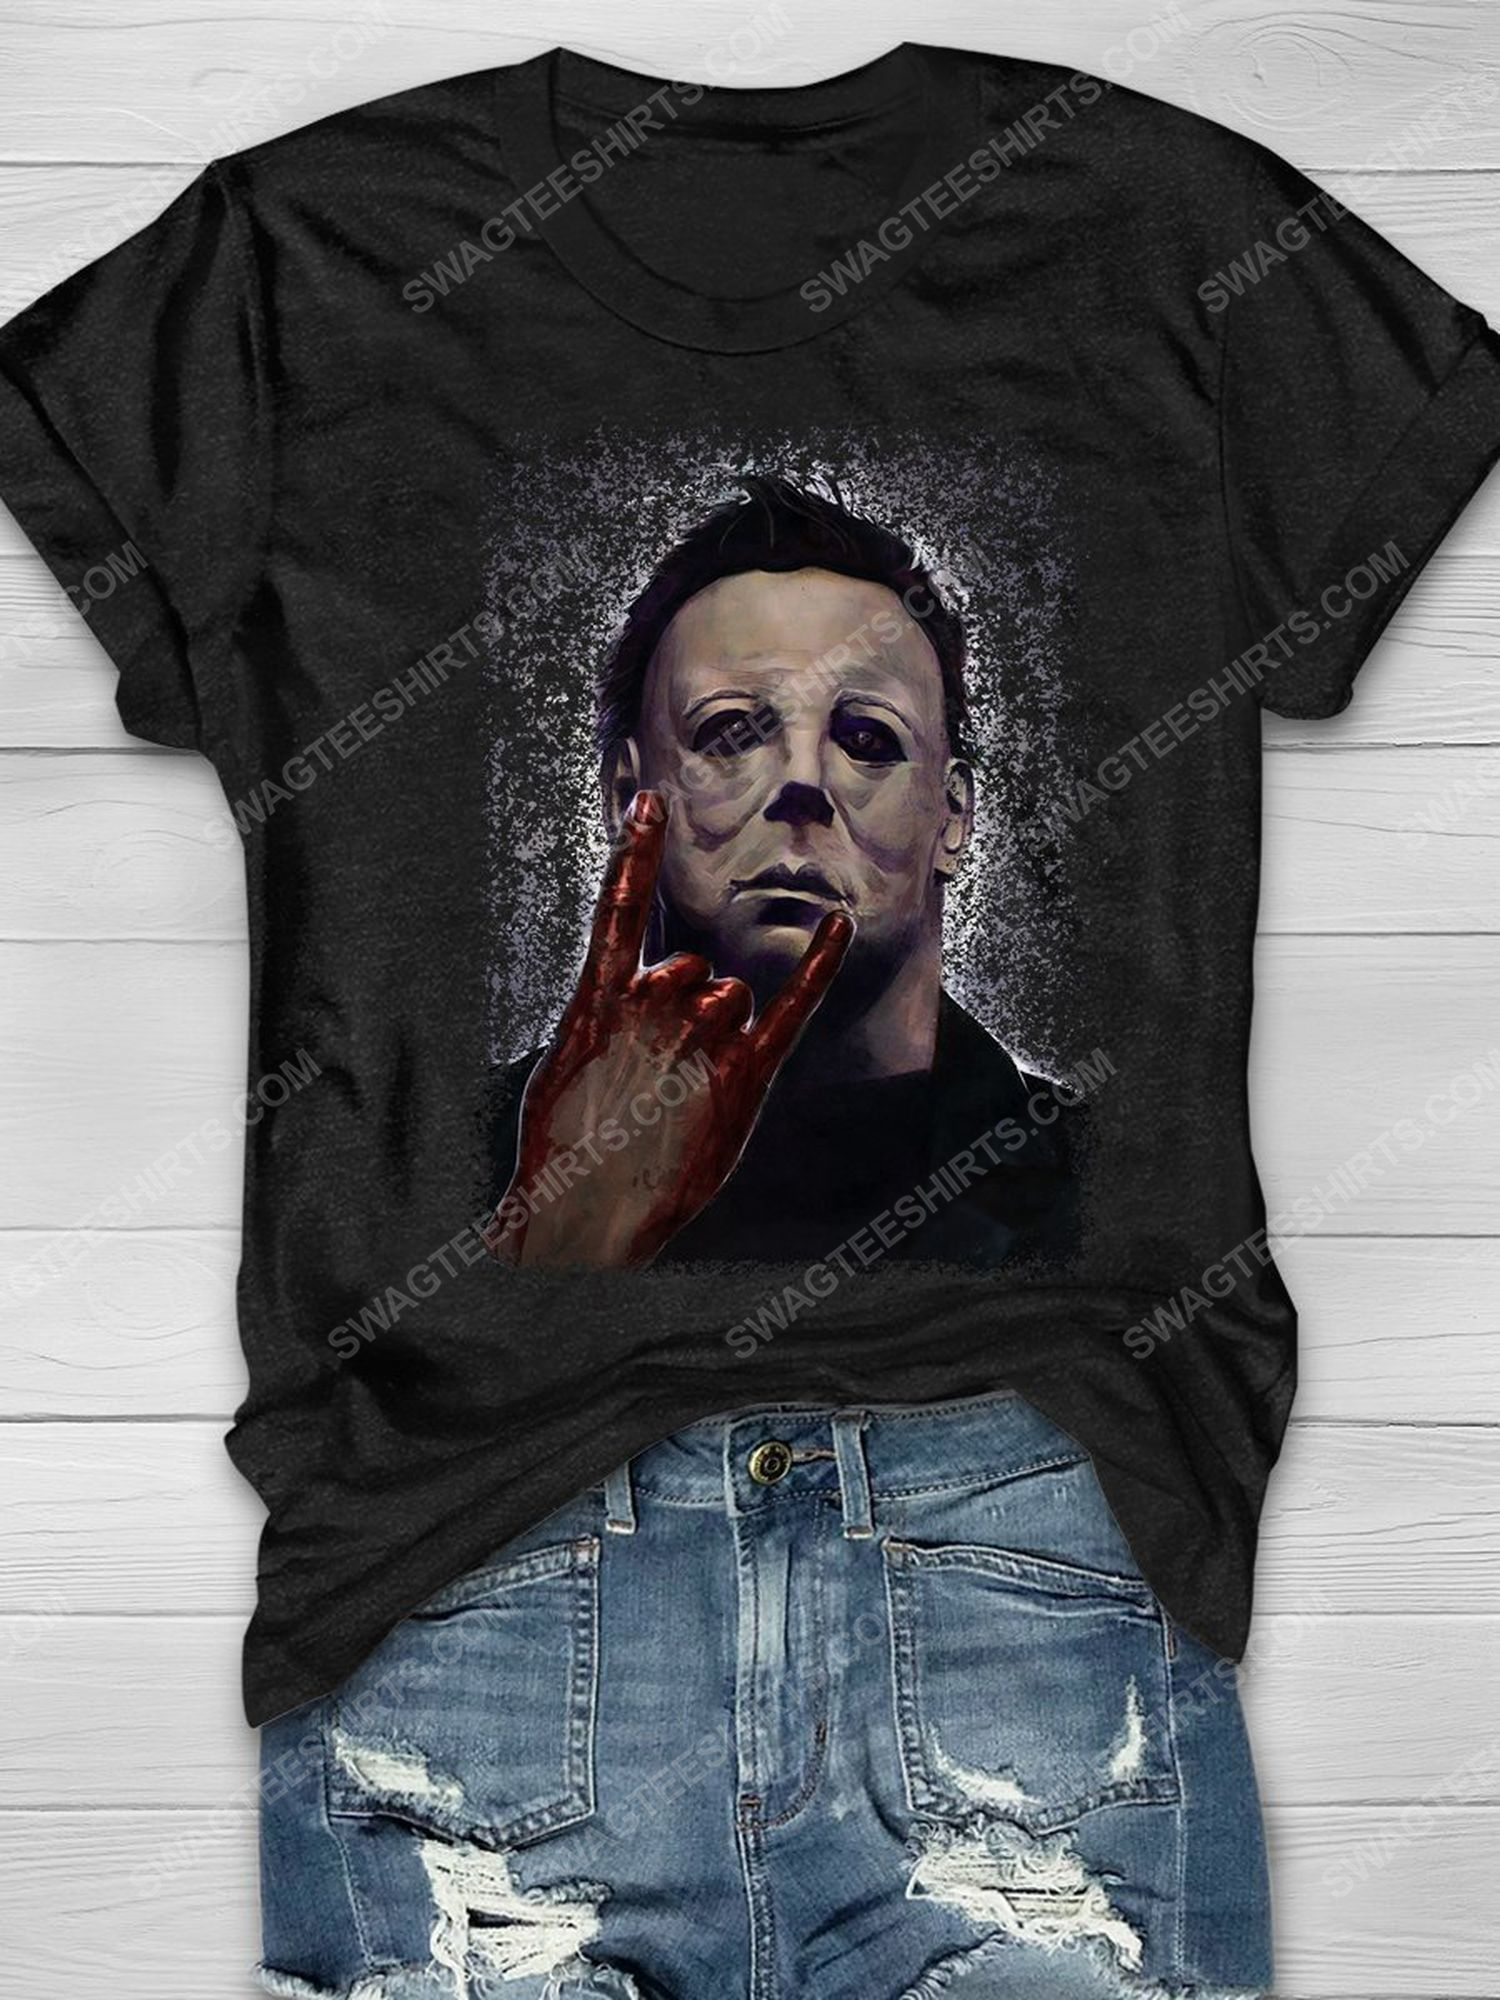 Michael myers scary movies rock hand halloween shirt 1 - Copy